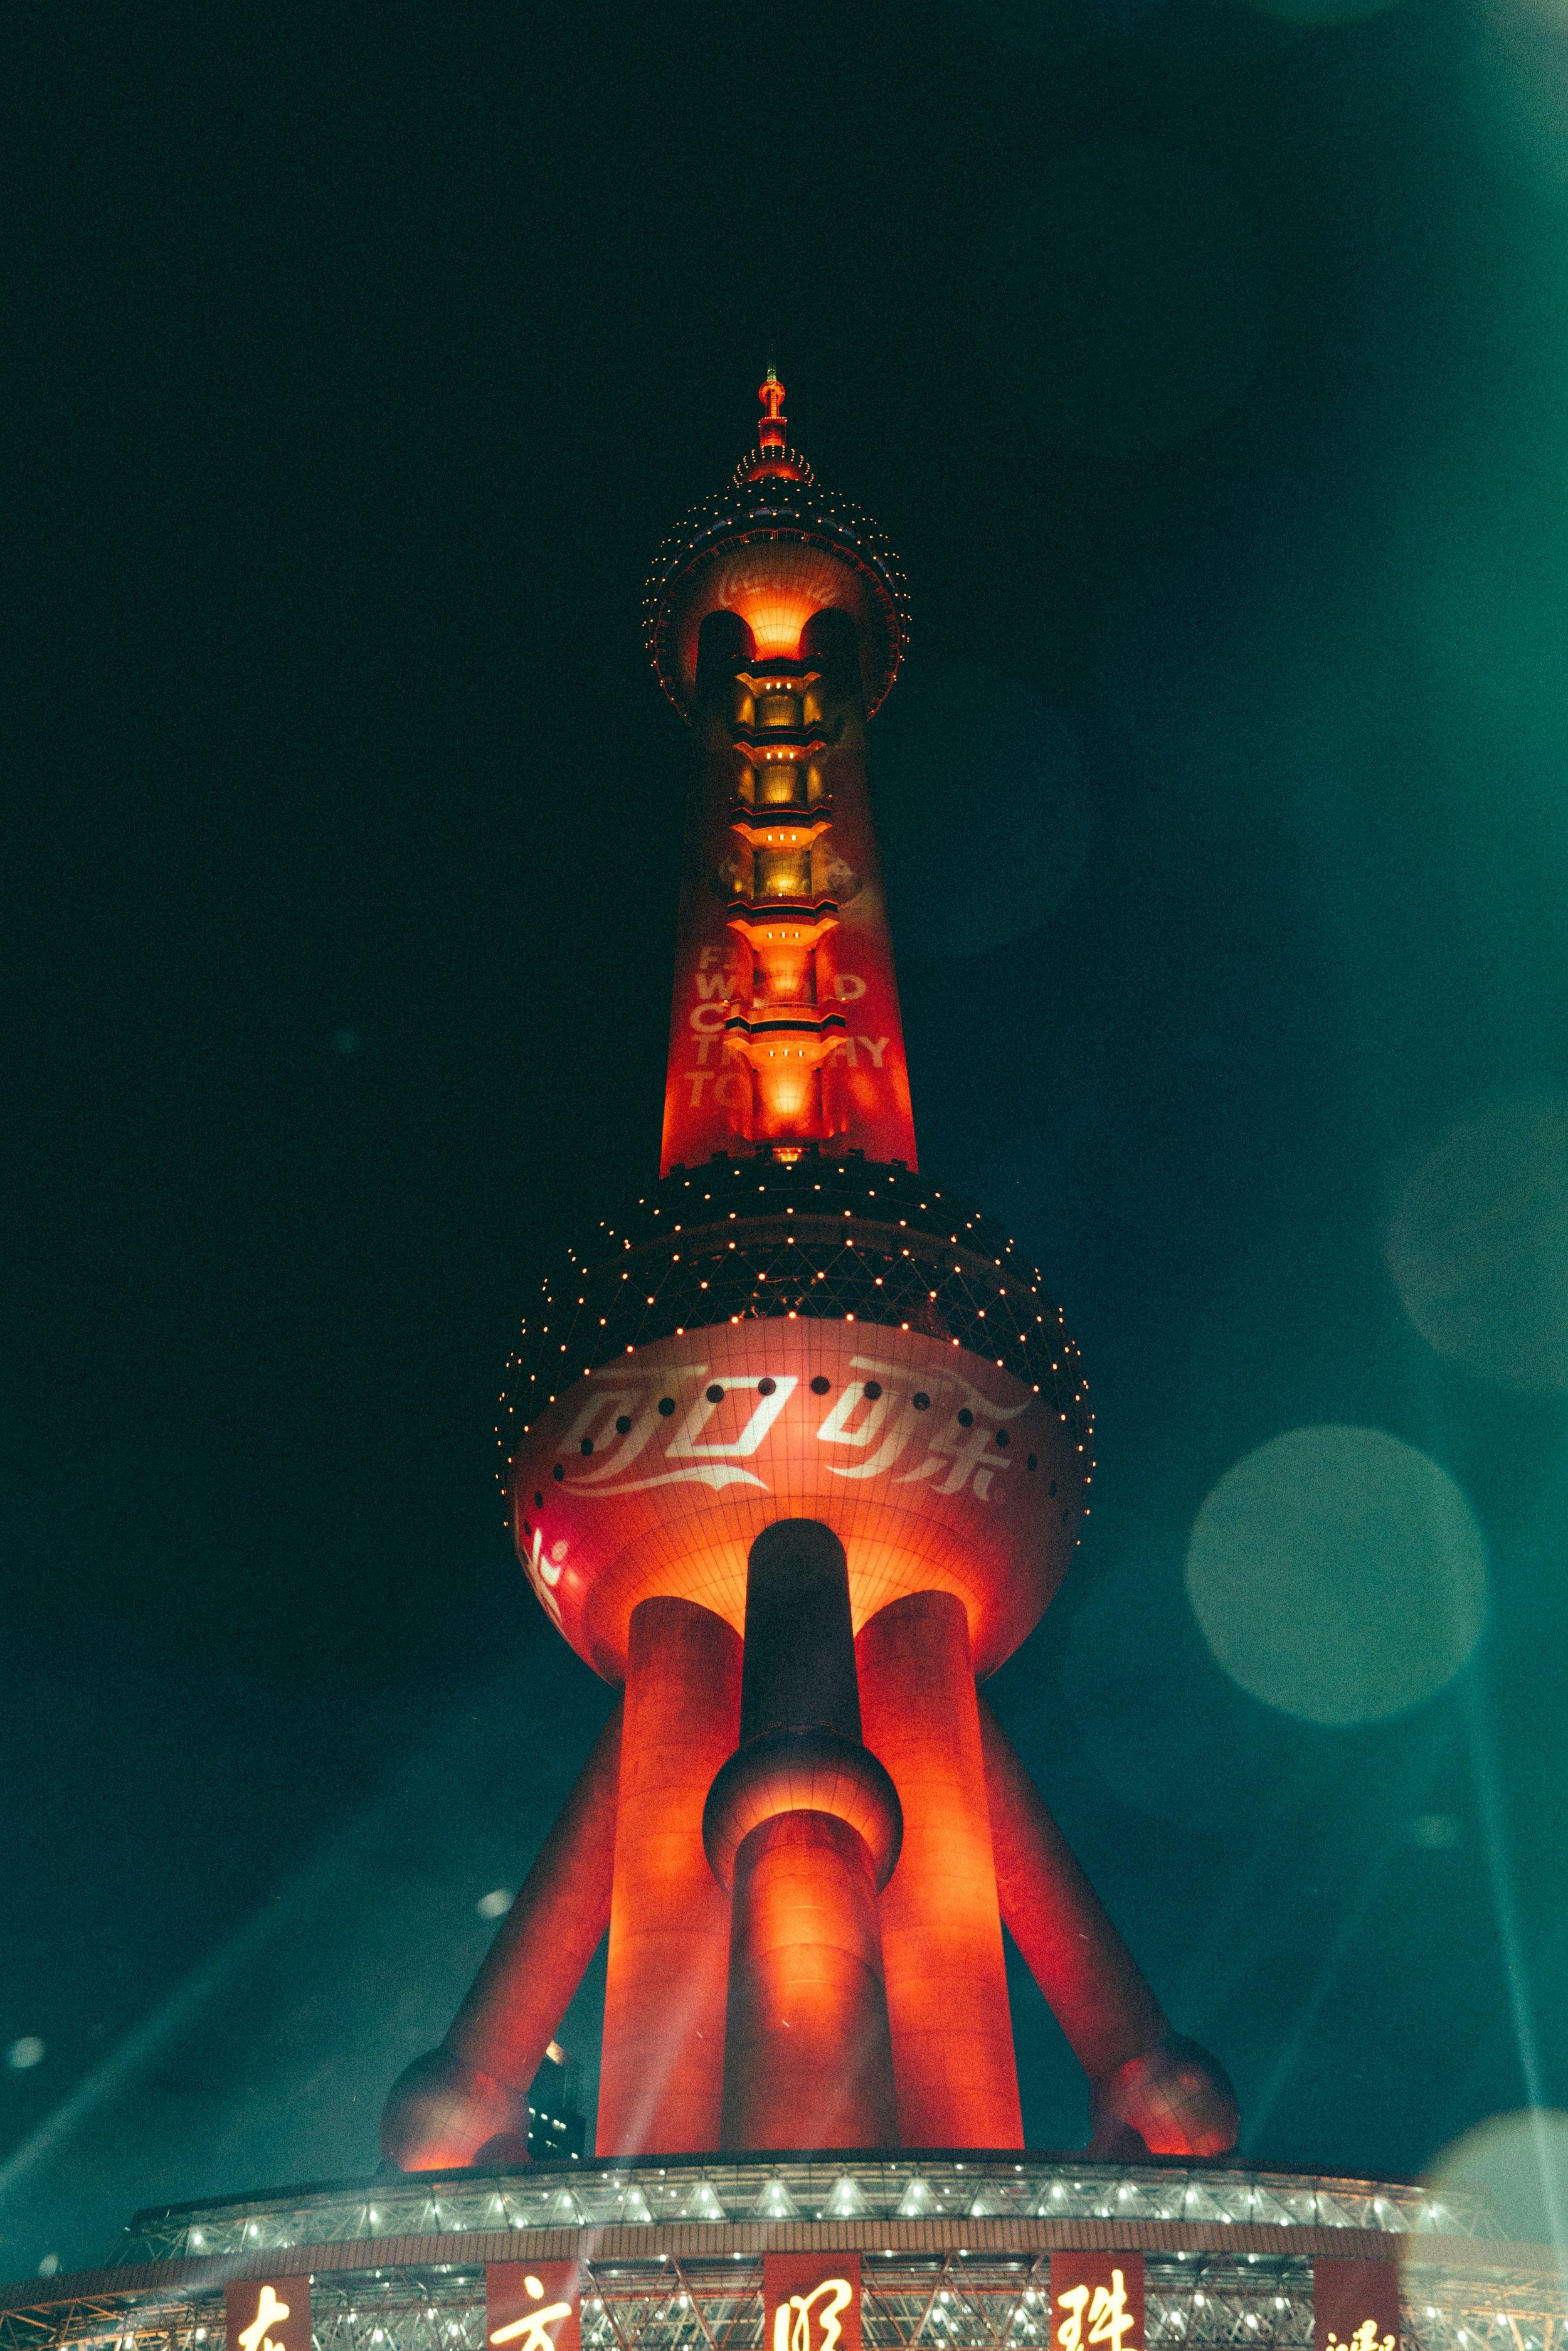 20180810_WCTT_China-DSC03713-2.jpg